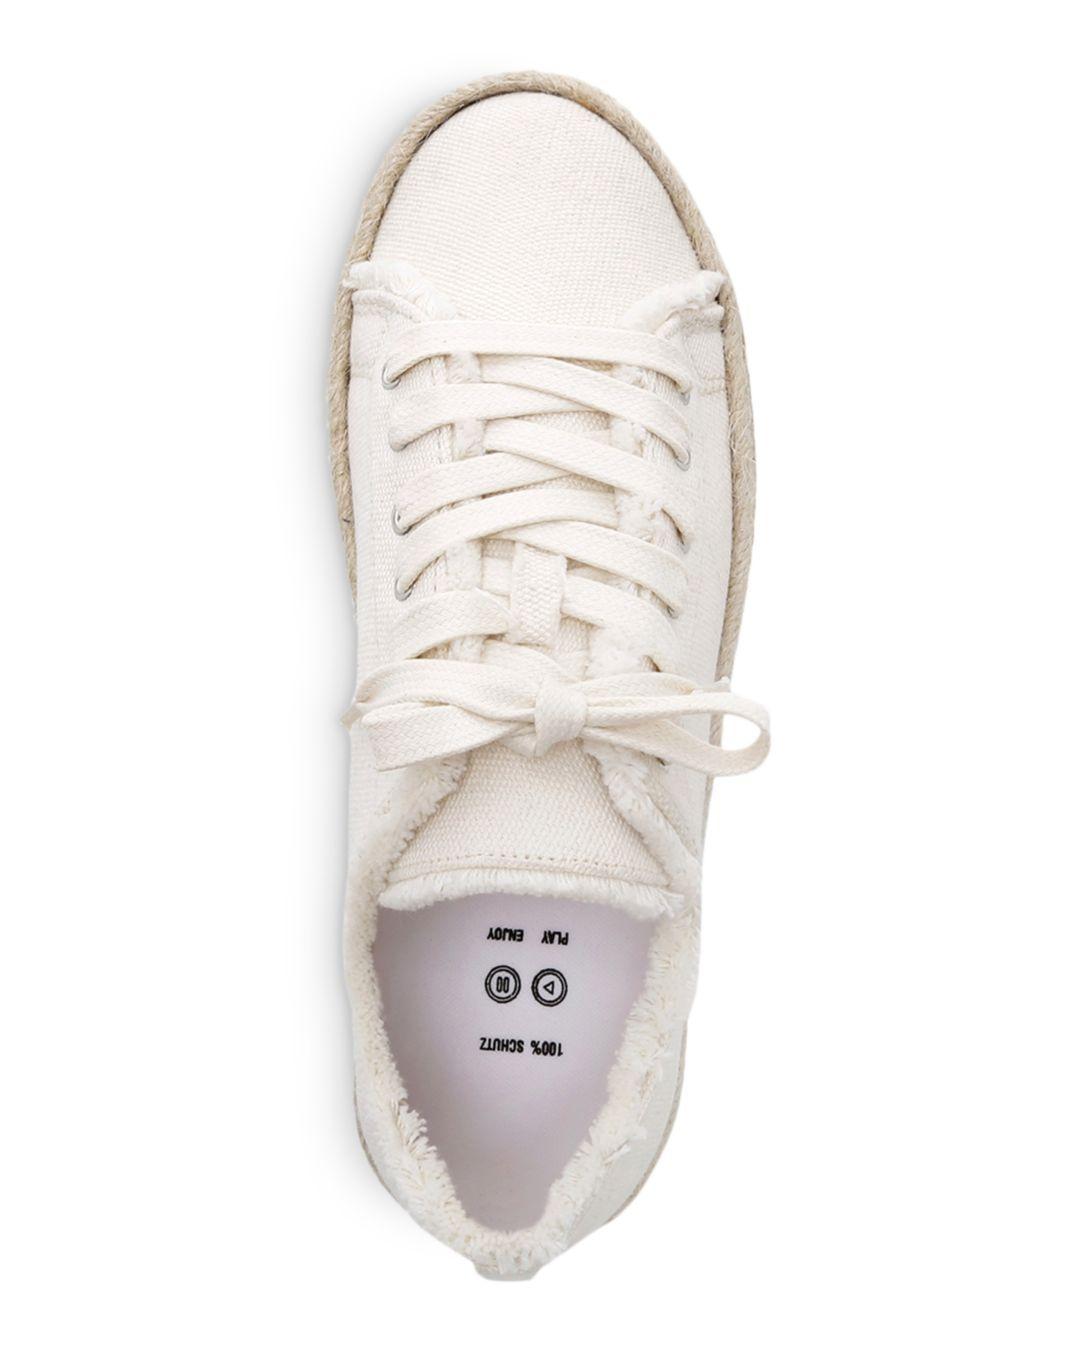 474857a0f1a2 Schutz - White Women s Luana Espadrille Lace-up Sneakers - Lyst. View  fullscreen